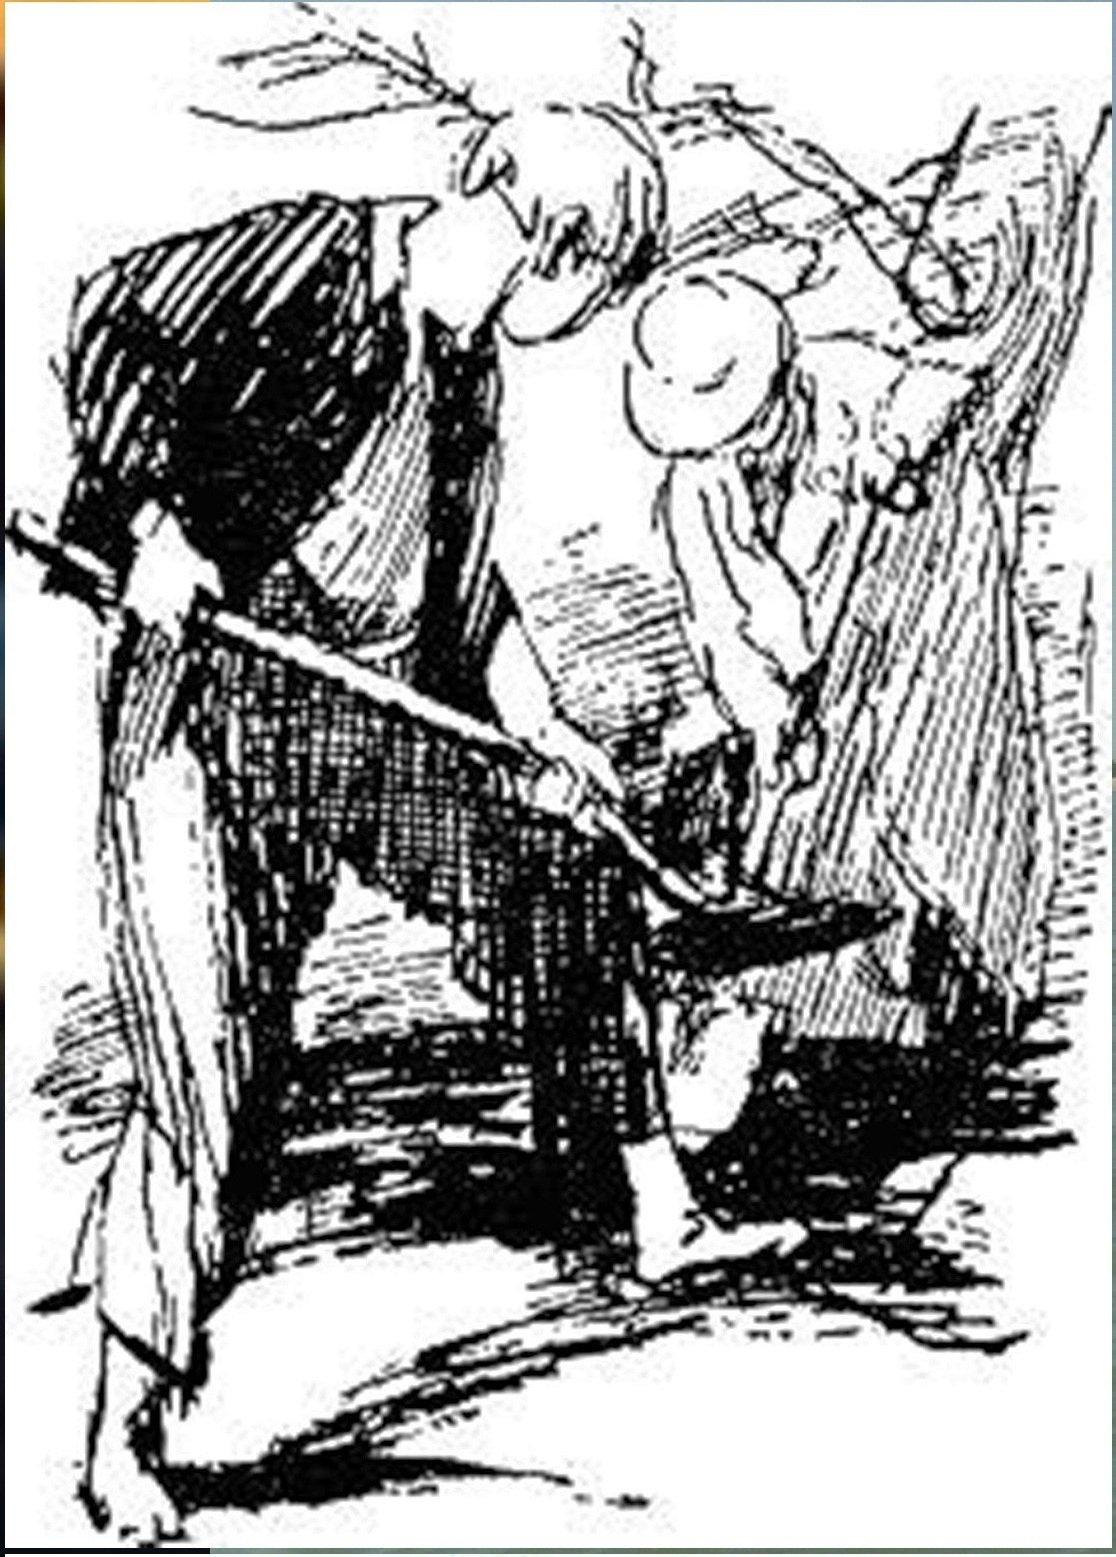 Иллюстрация В. Н. Горяева к пр-ю М.Твена Приключения Тома Сойера (33).